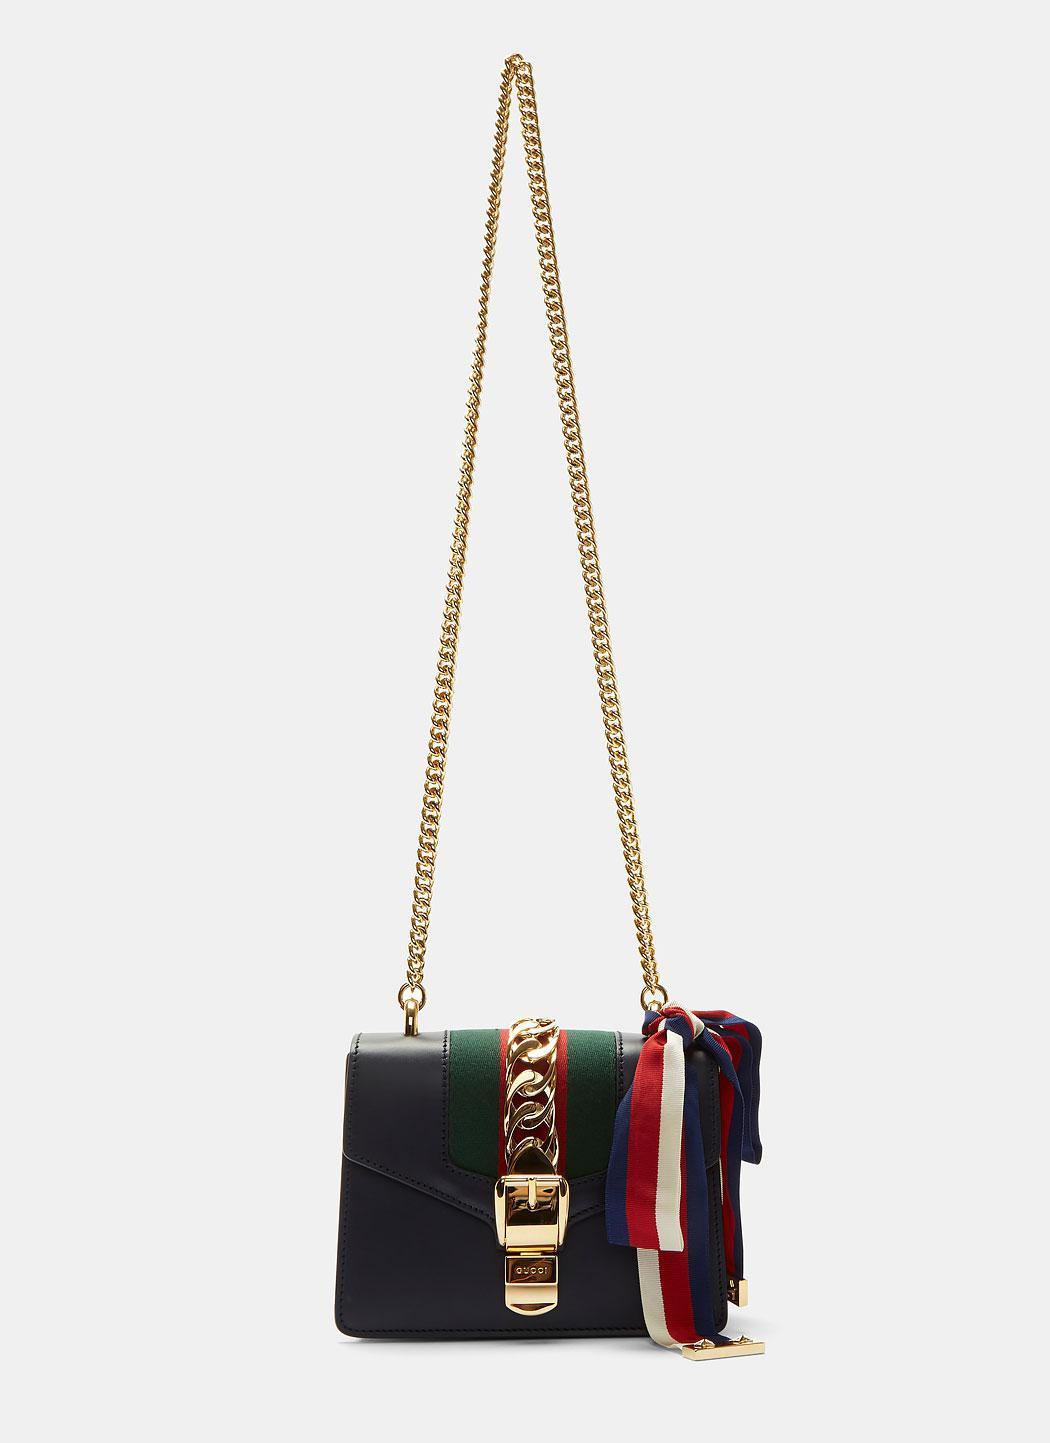 26b0866396f Lyst - Gucci Sylvie Chain Mini Shoulder Bag In Navy in Blue